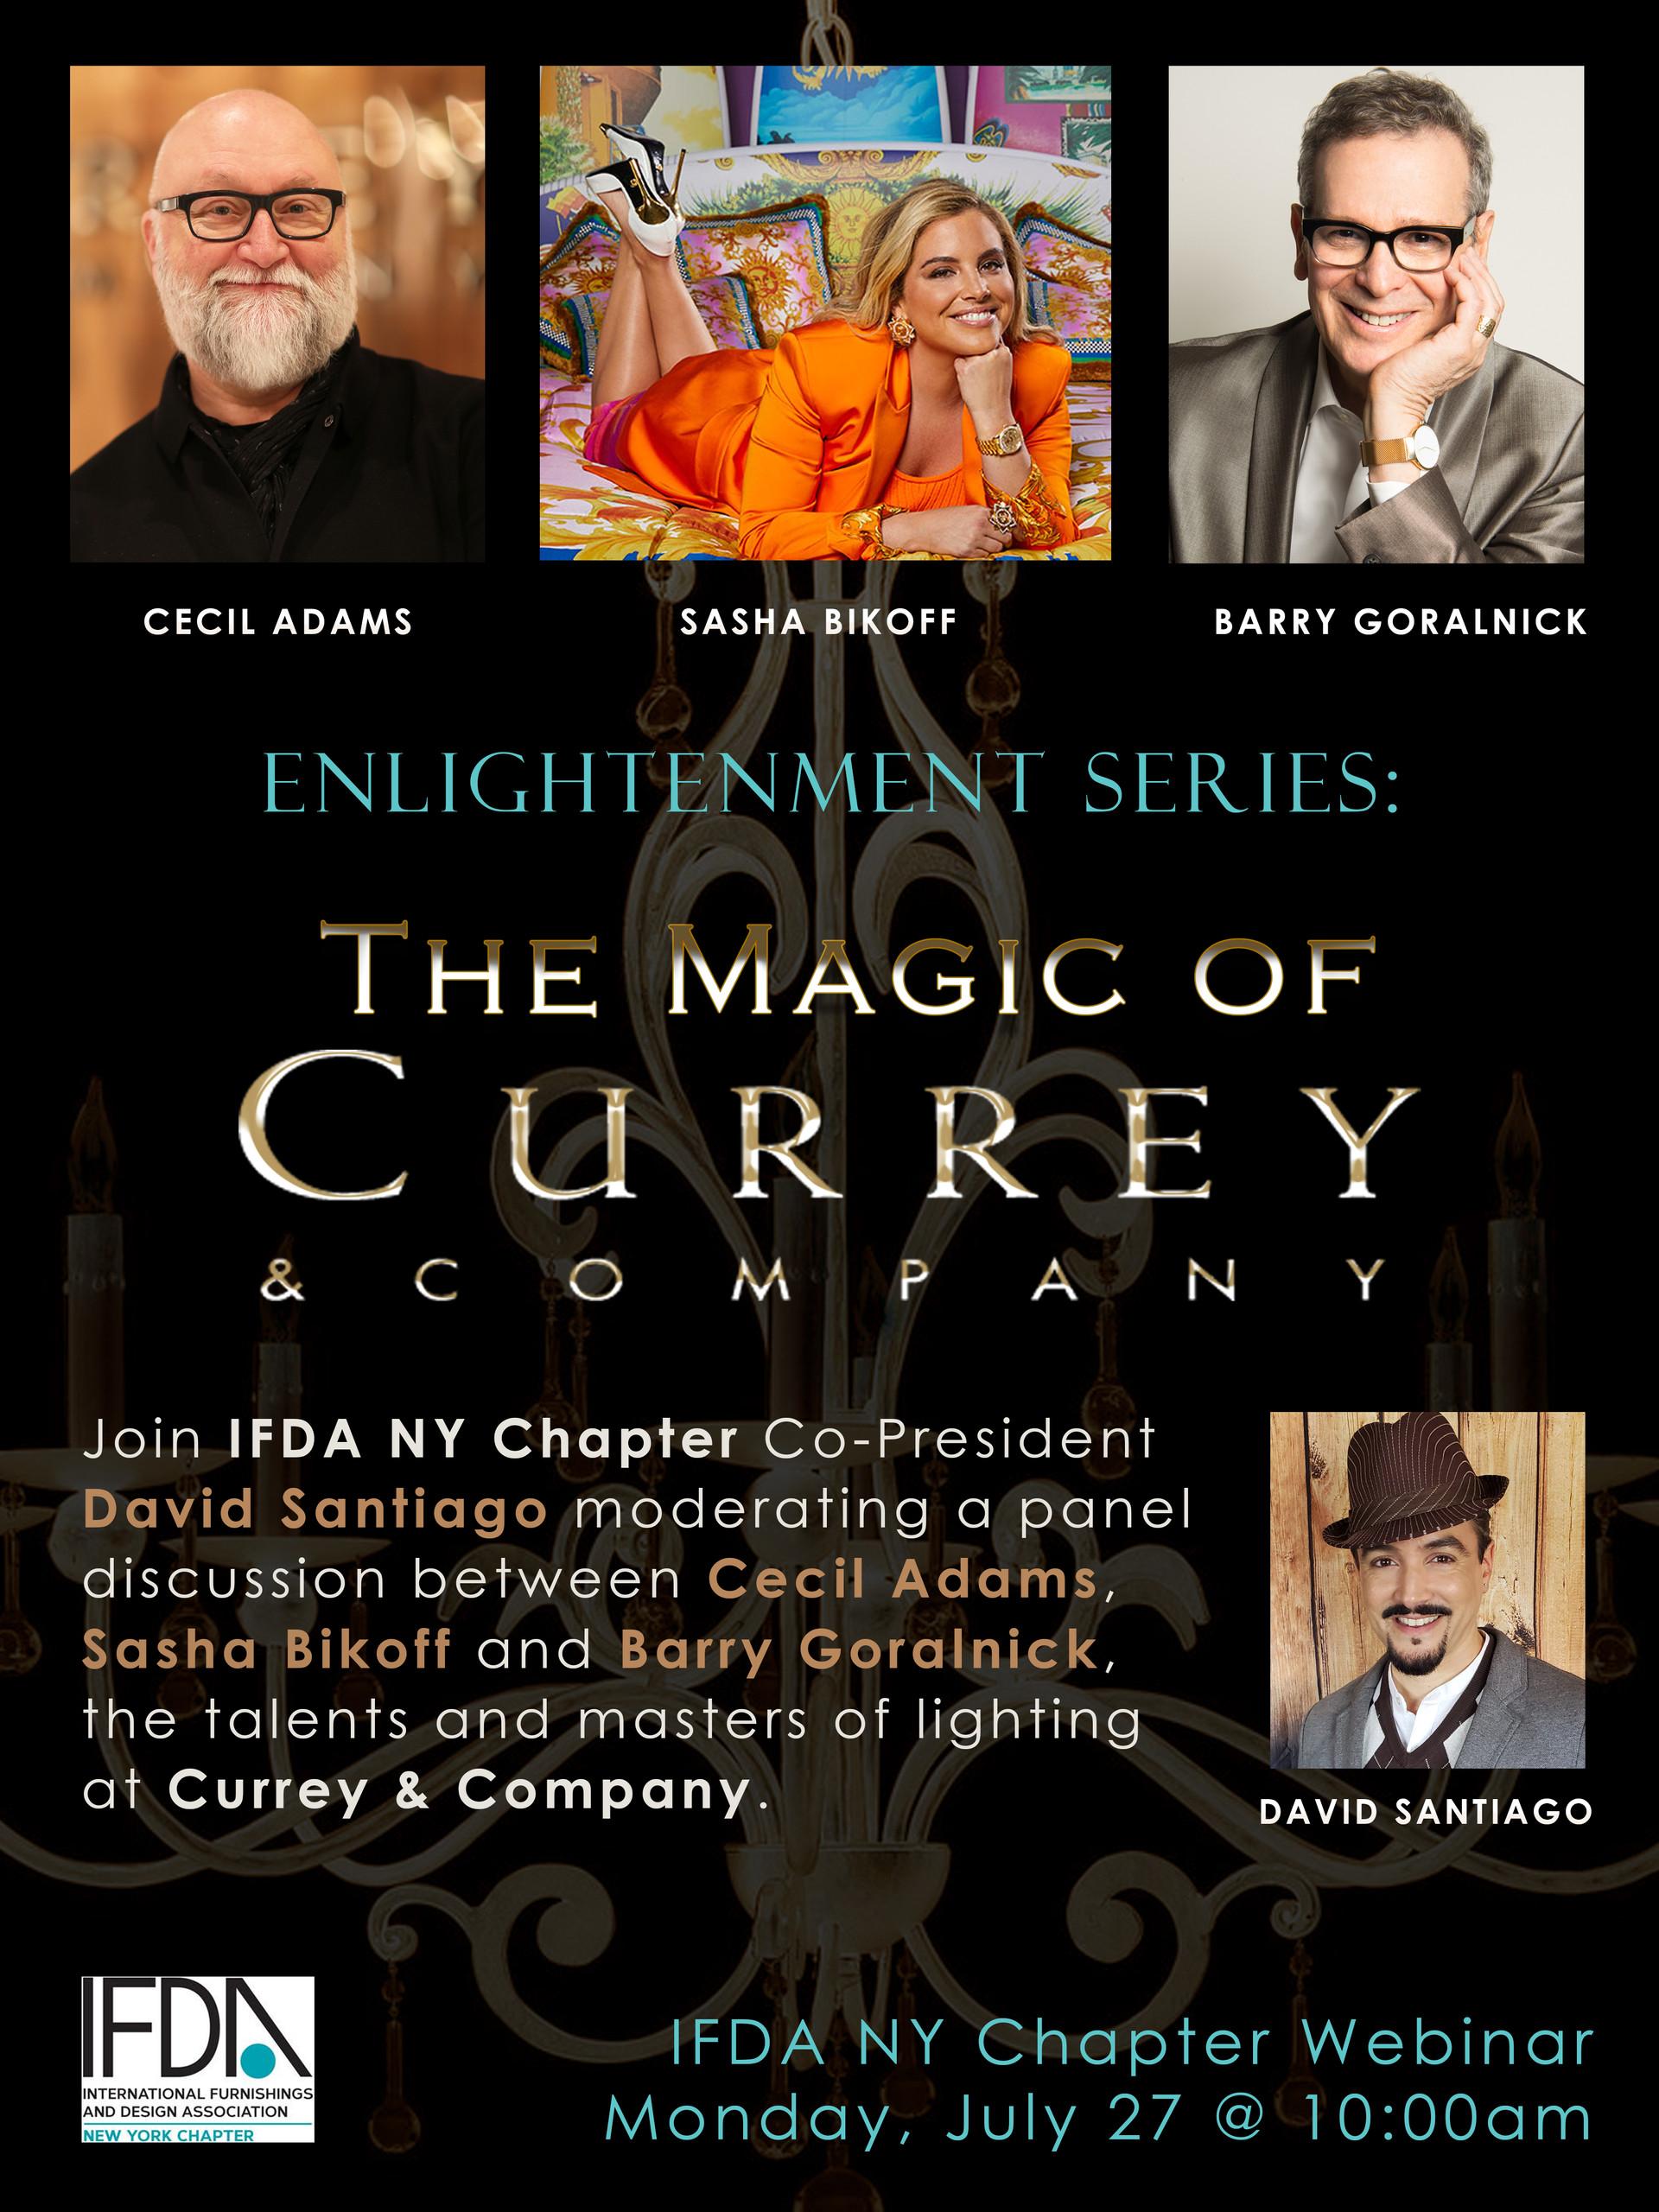 The Magic of Currey & Company